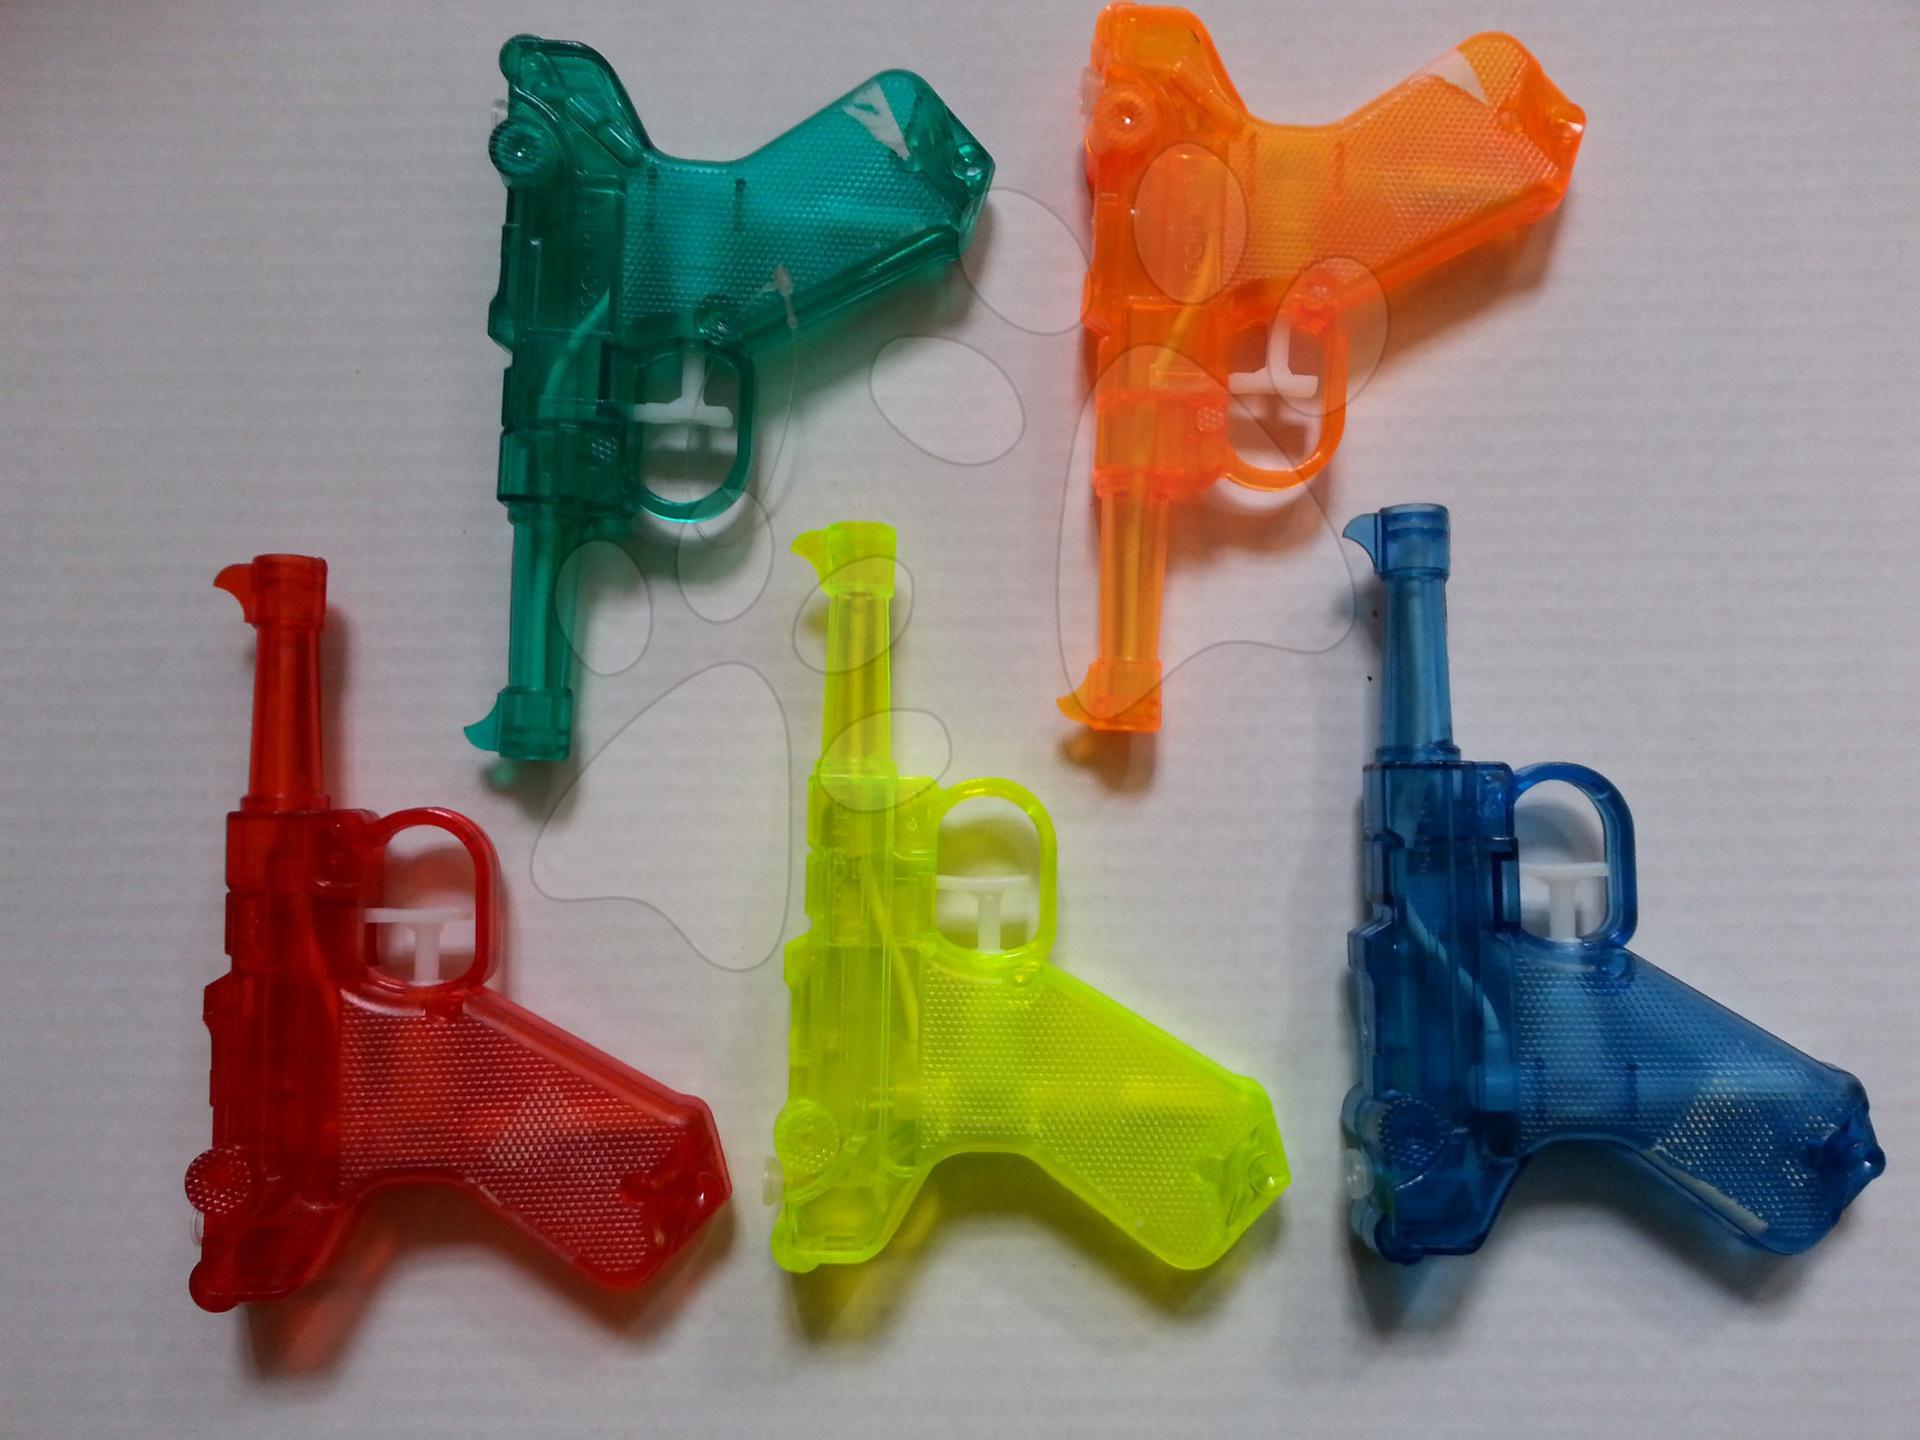 Maxi vodná pištoľ Dohány v 5 farbách